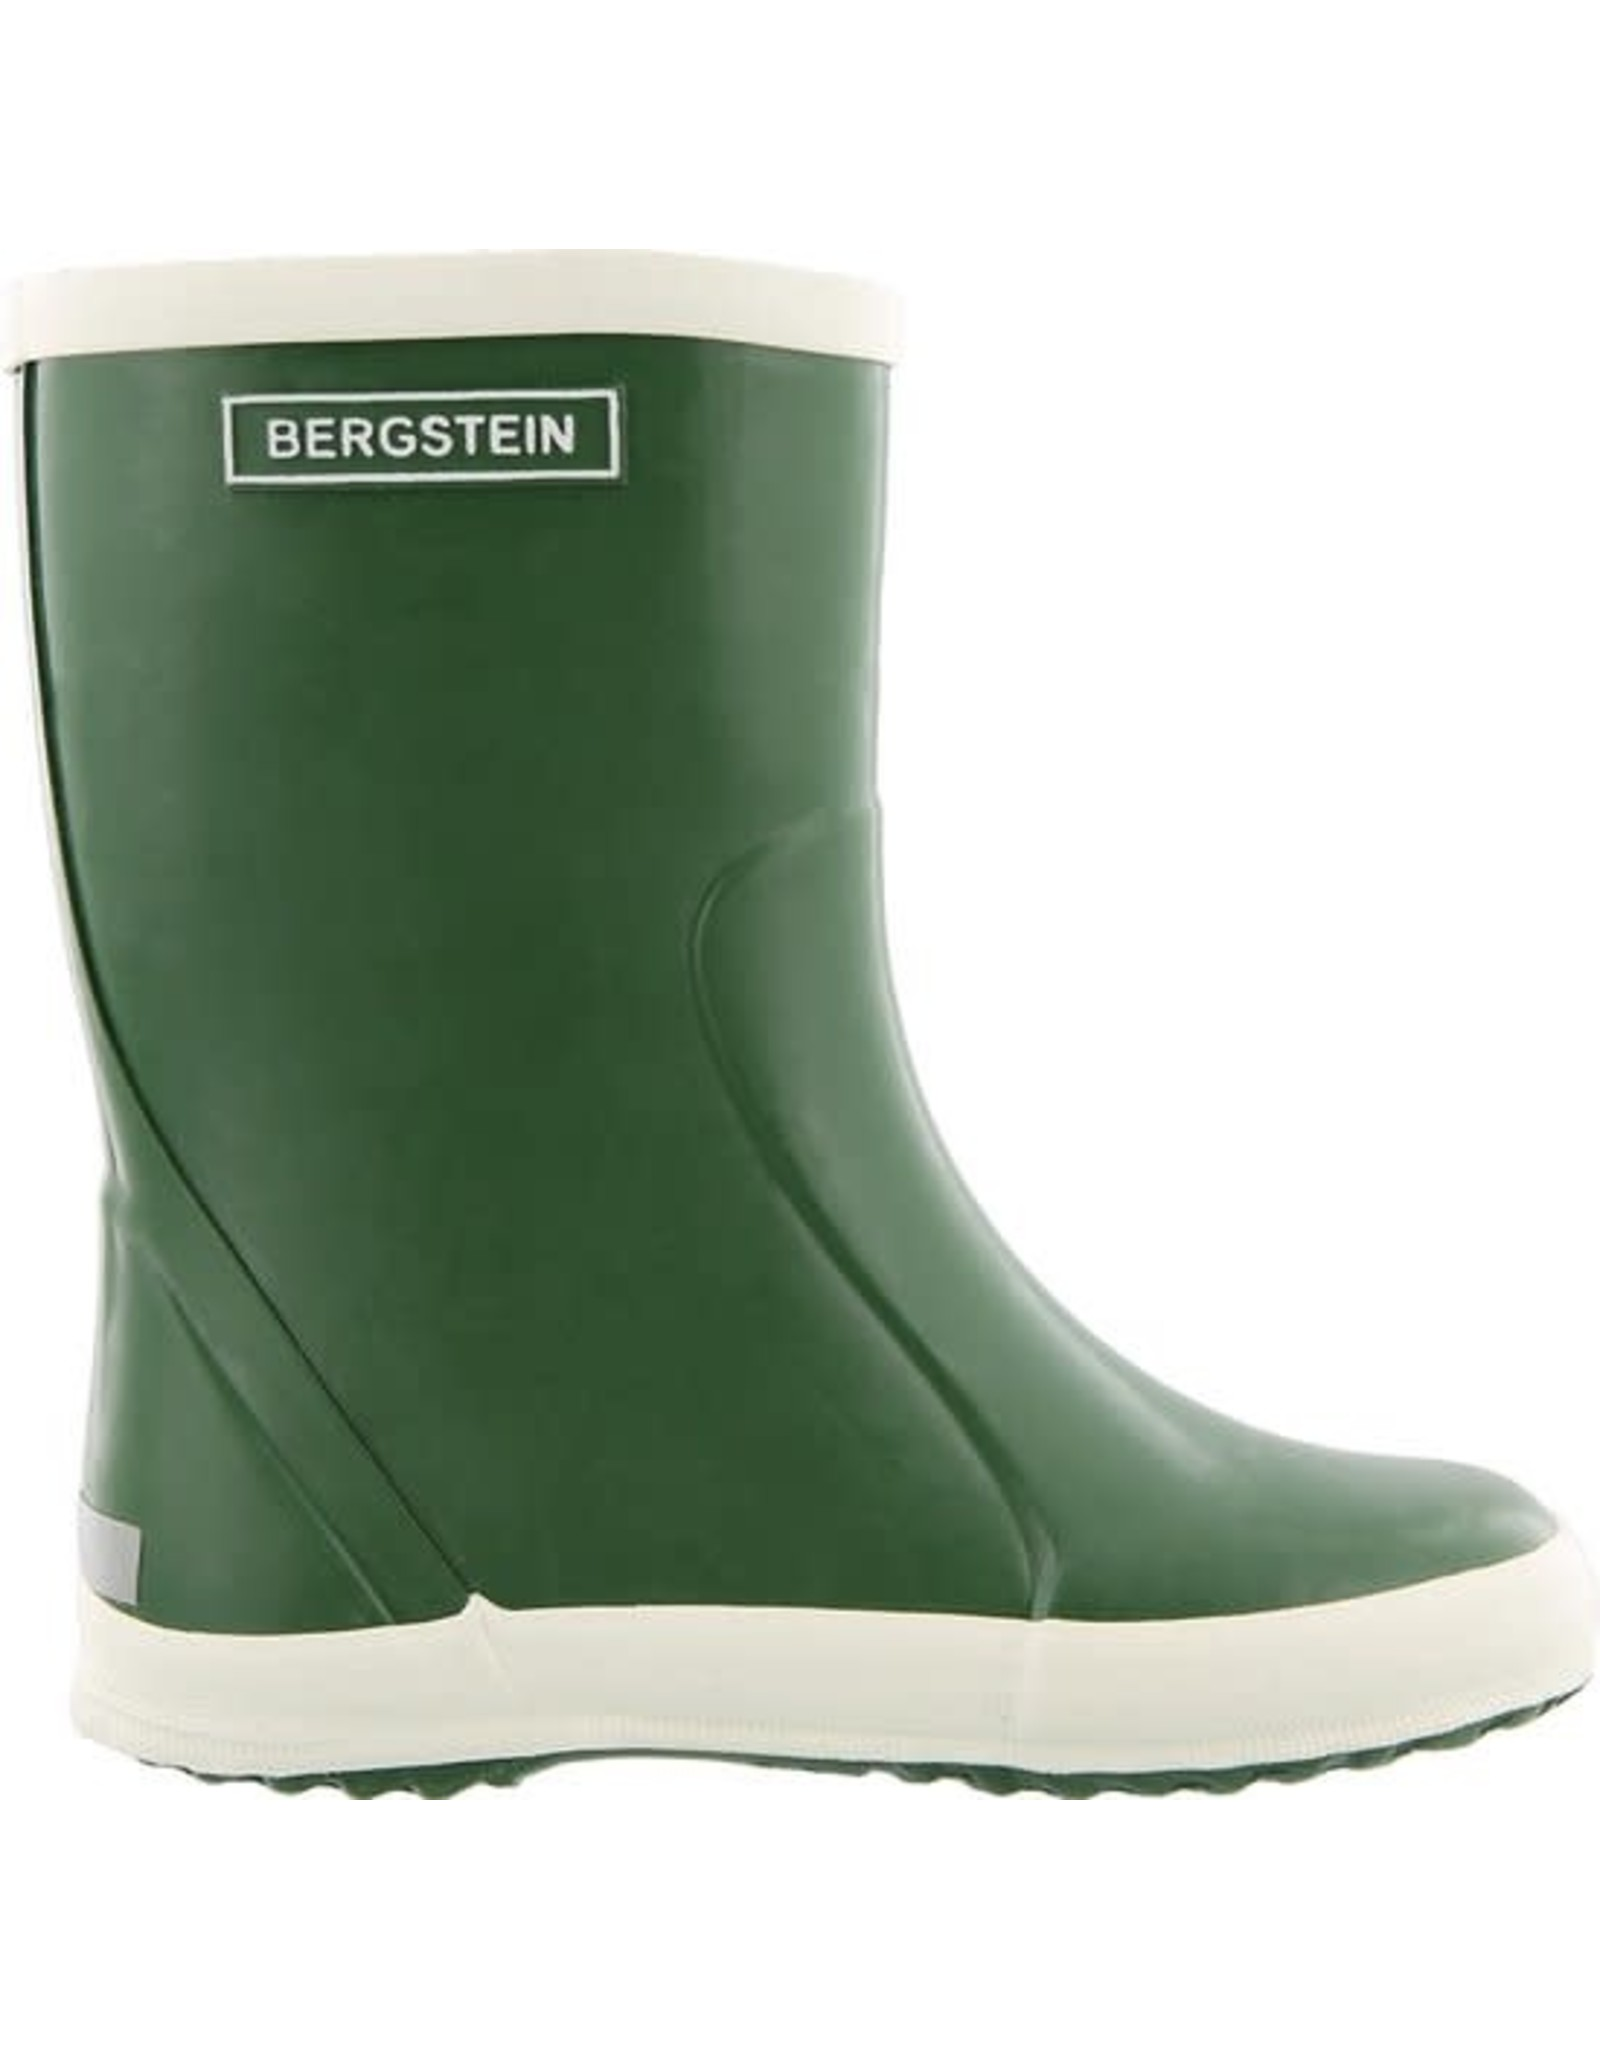 Bergstein Rain boot Forest